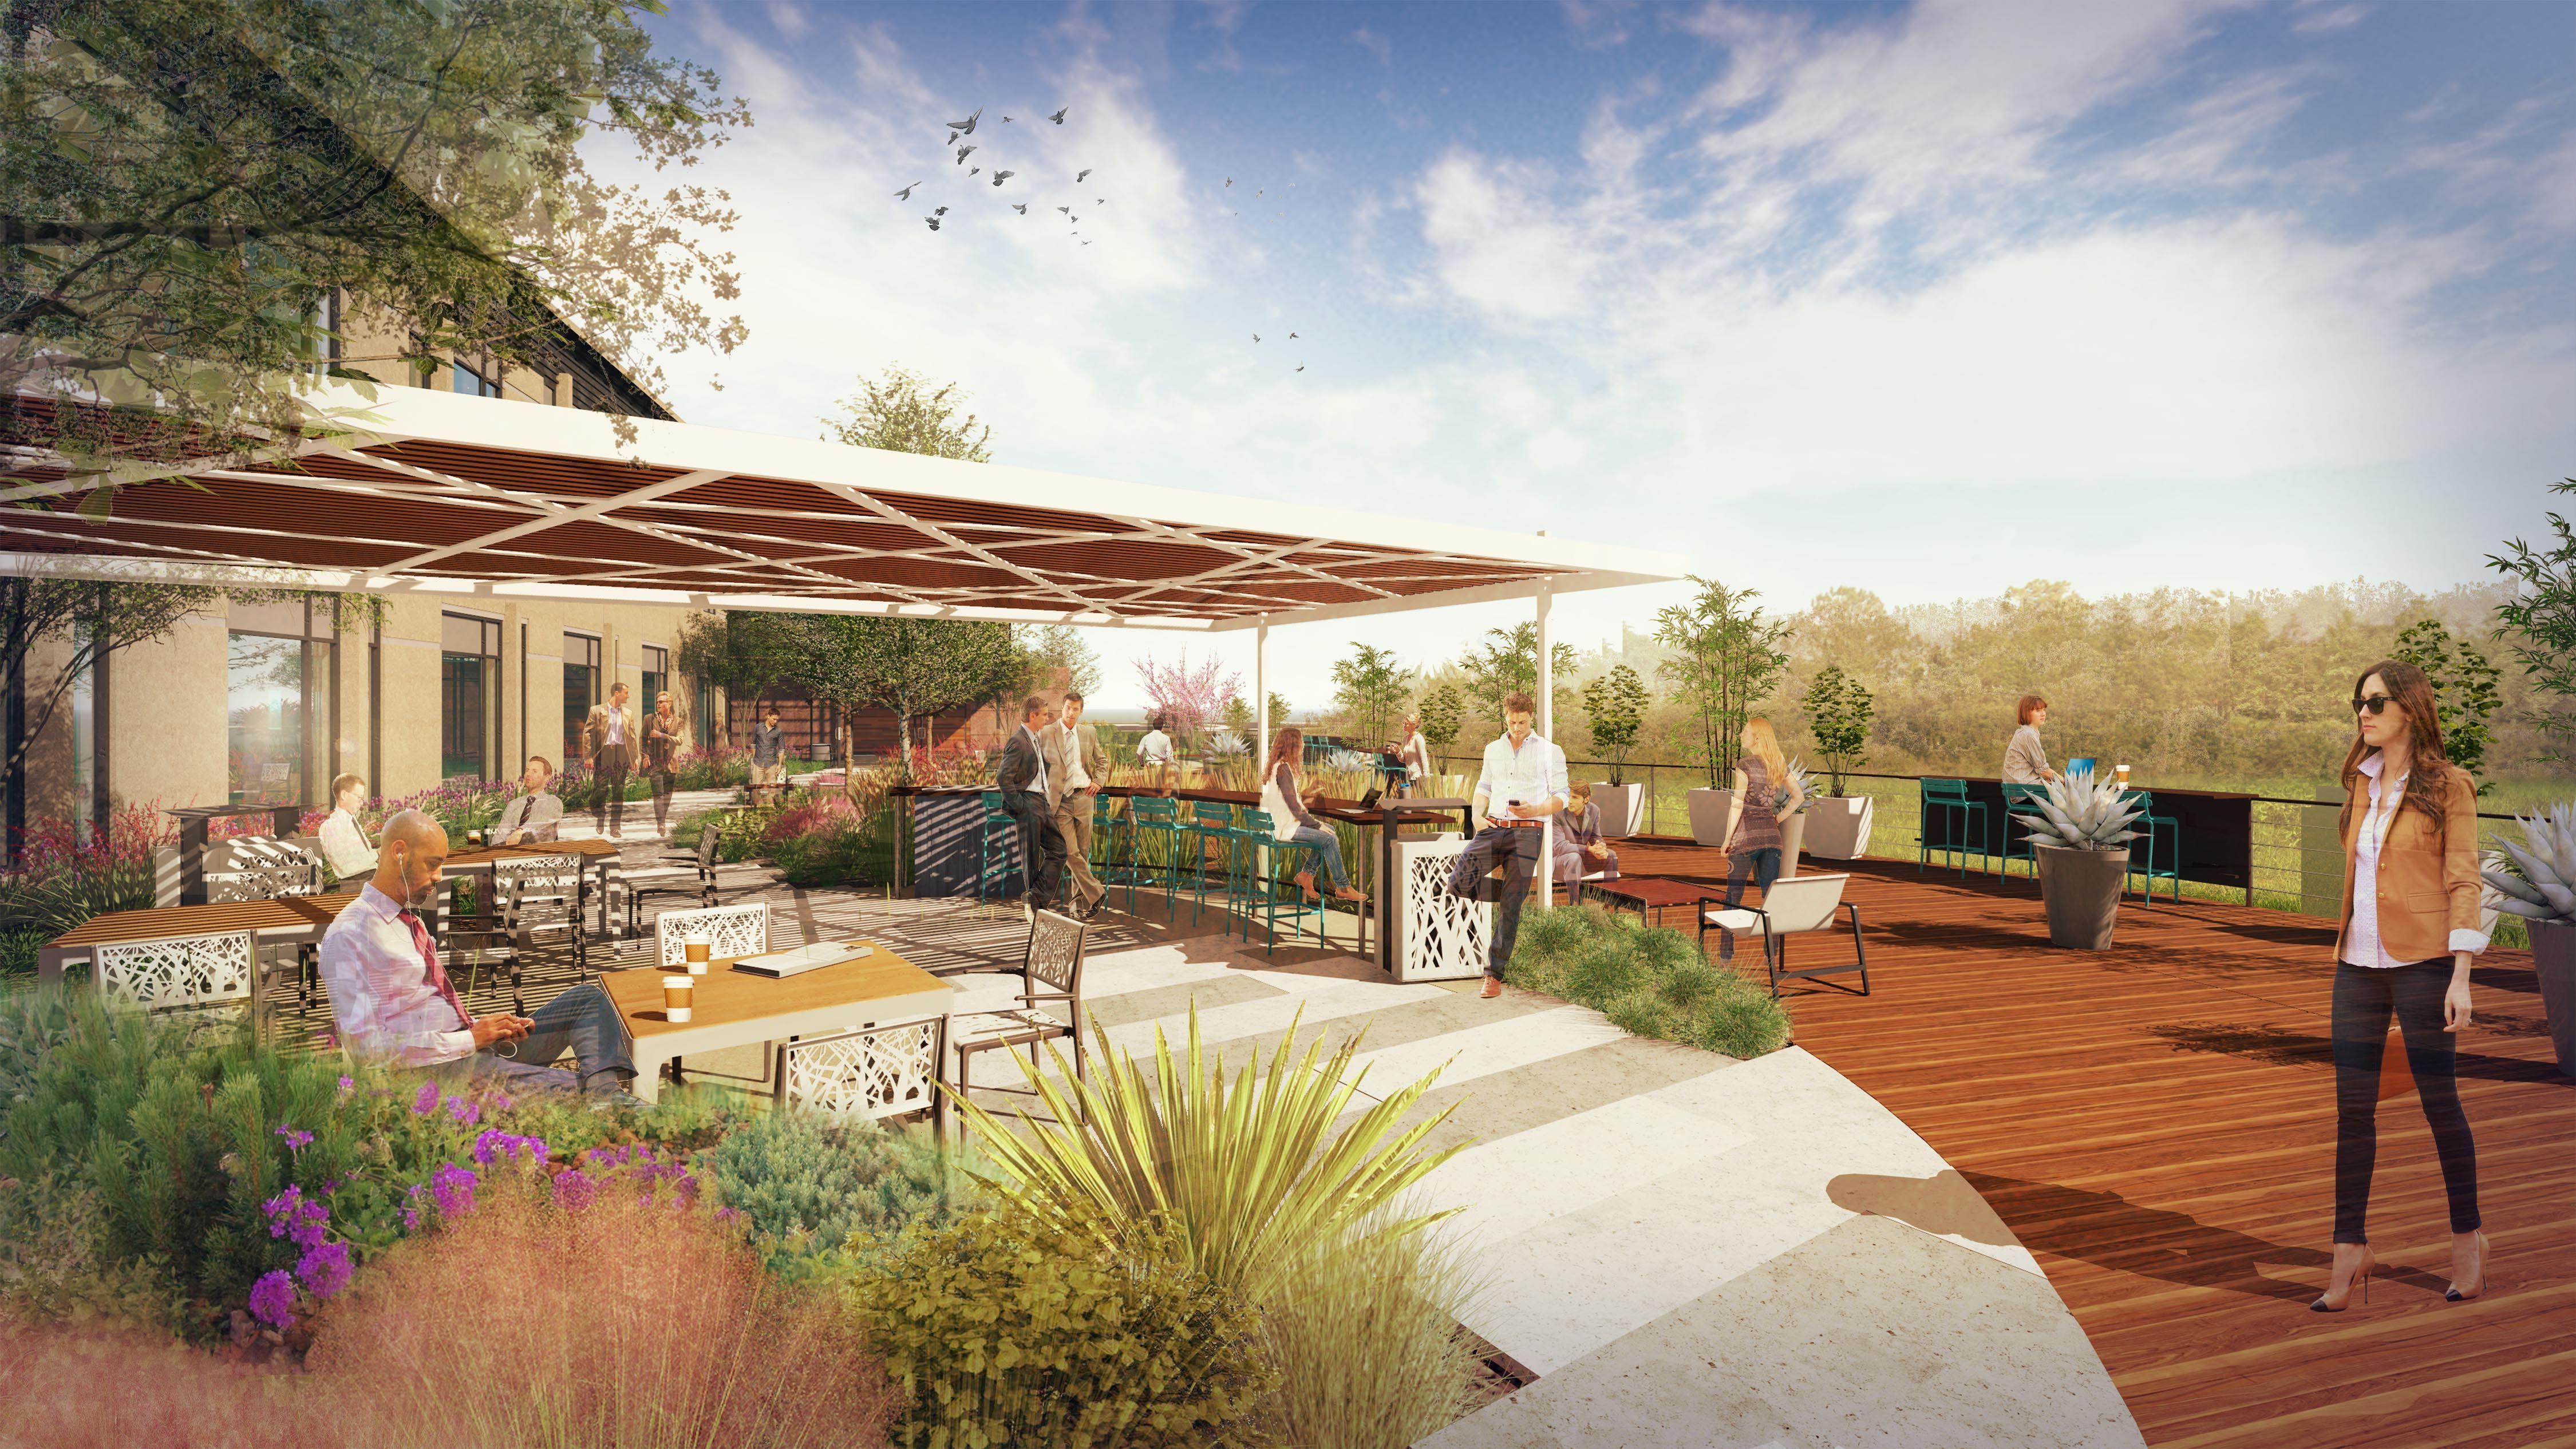 office patio design rendering perspective lumion photoshop sketchup pergola pavilion - Patio Landscape Architecture Design